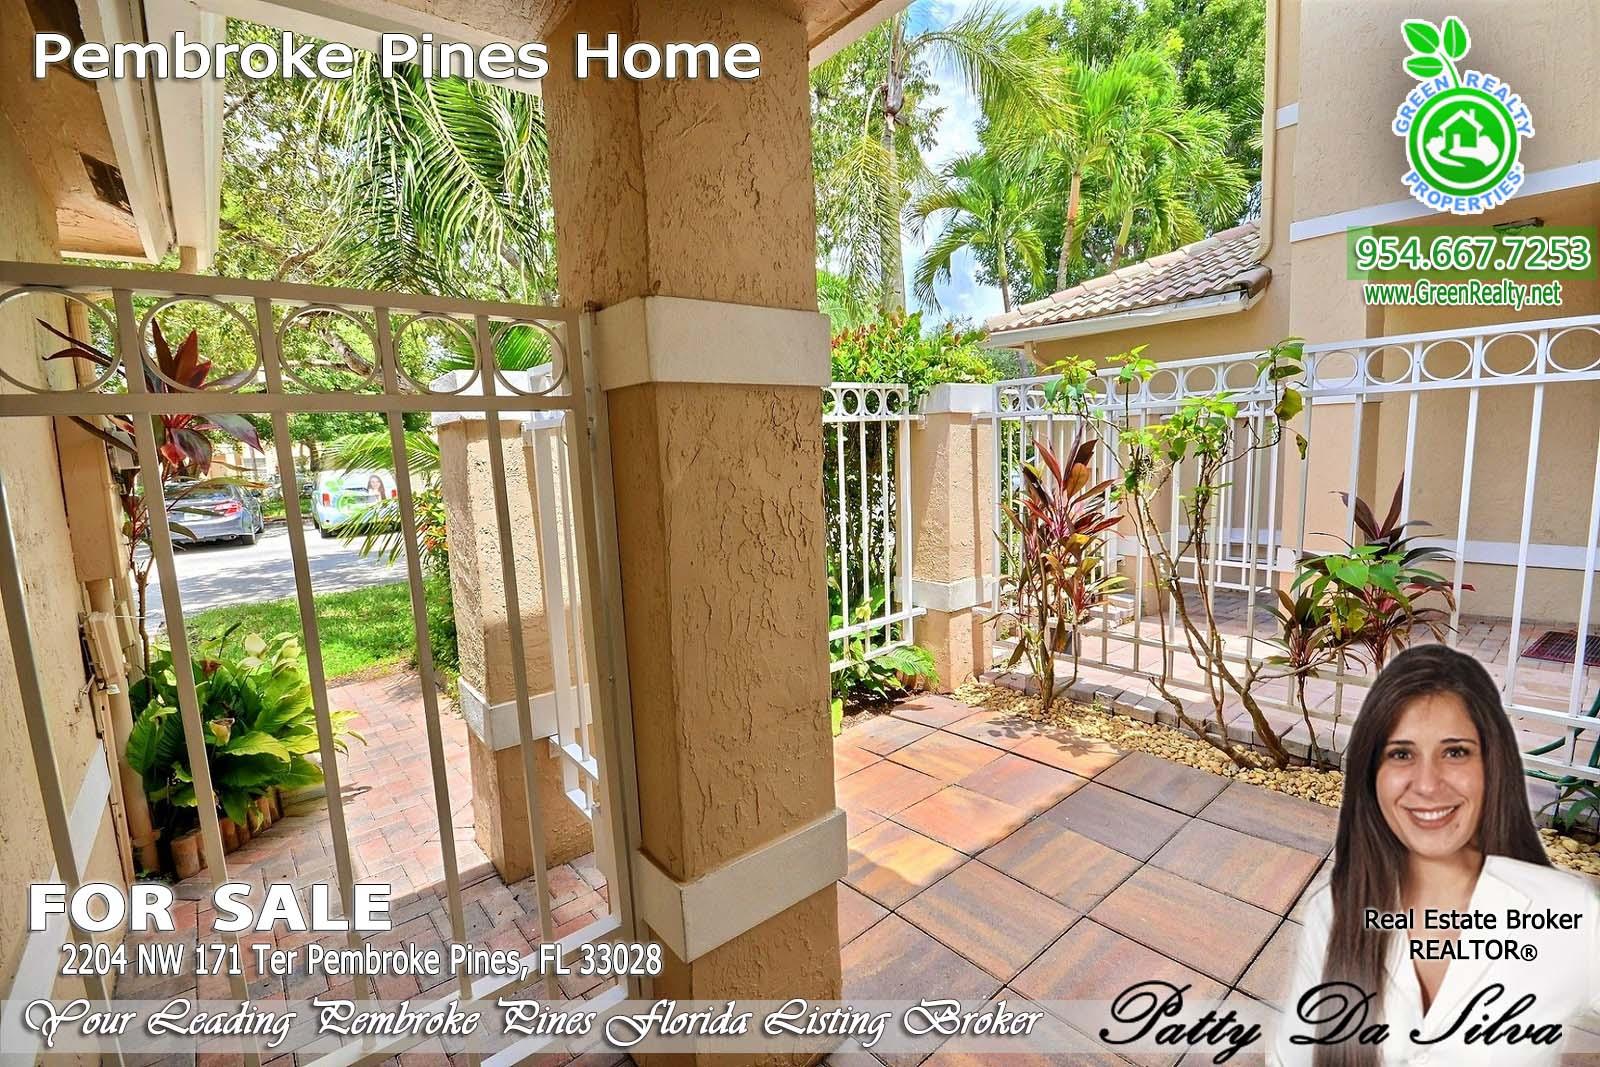 Pembroke Pines Homes For Sale - Pembroke Isles (4)